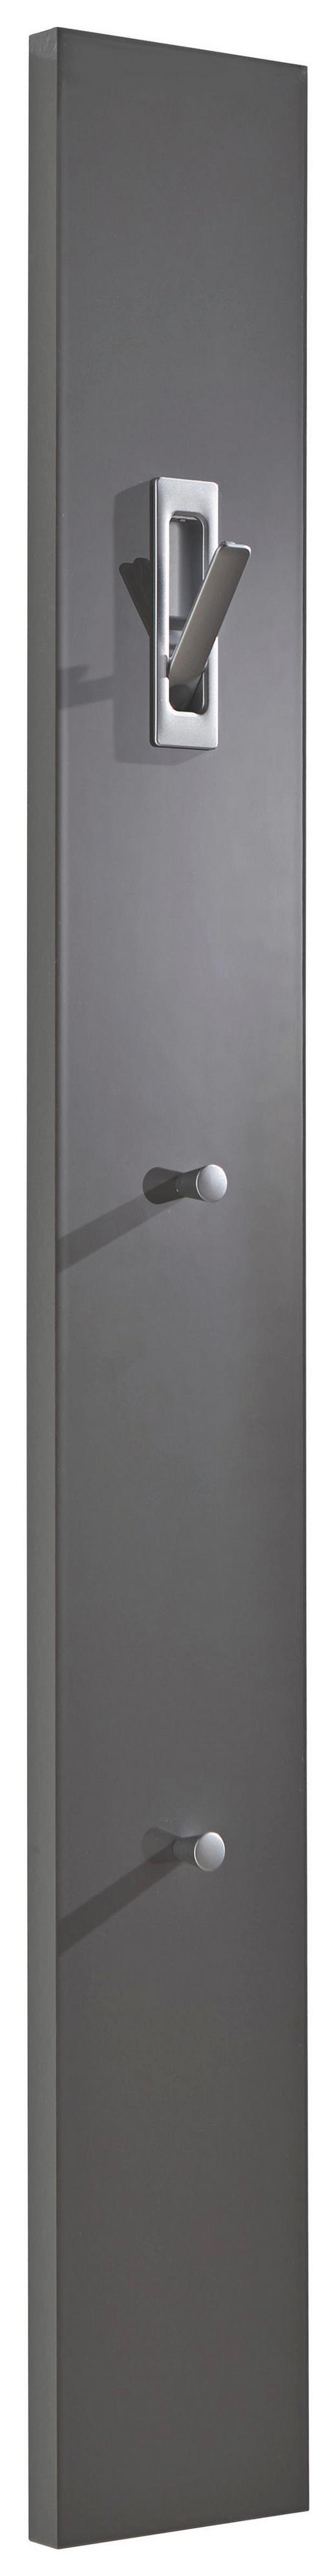 GARDEROBENPANEEL 15/120/2.5 cm - Grau, Design, Holzwerkstoff (15/120/2.5cm)